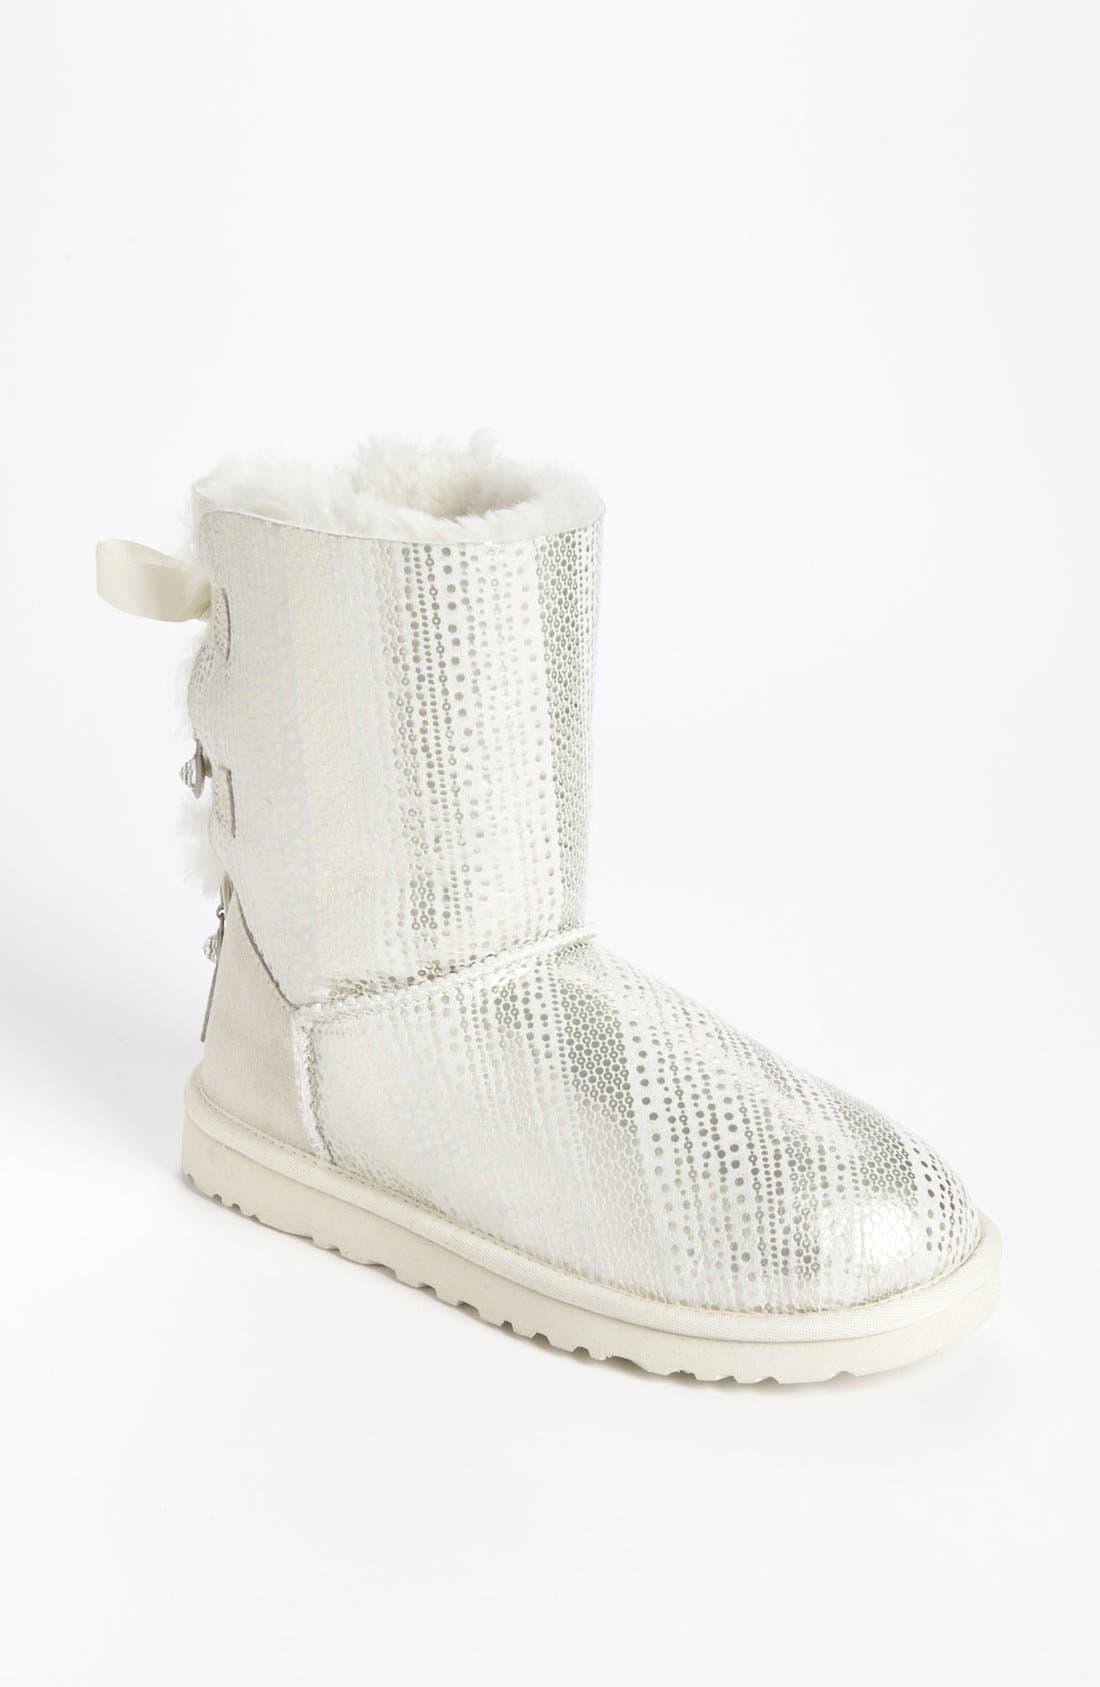 Main Image - UGG® 'Bailey Bow Bling' Boot (Women)